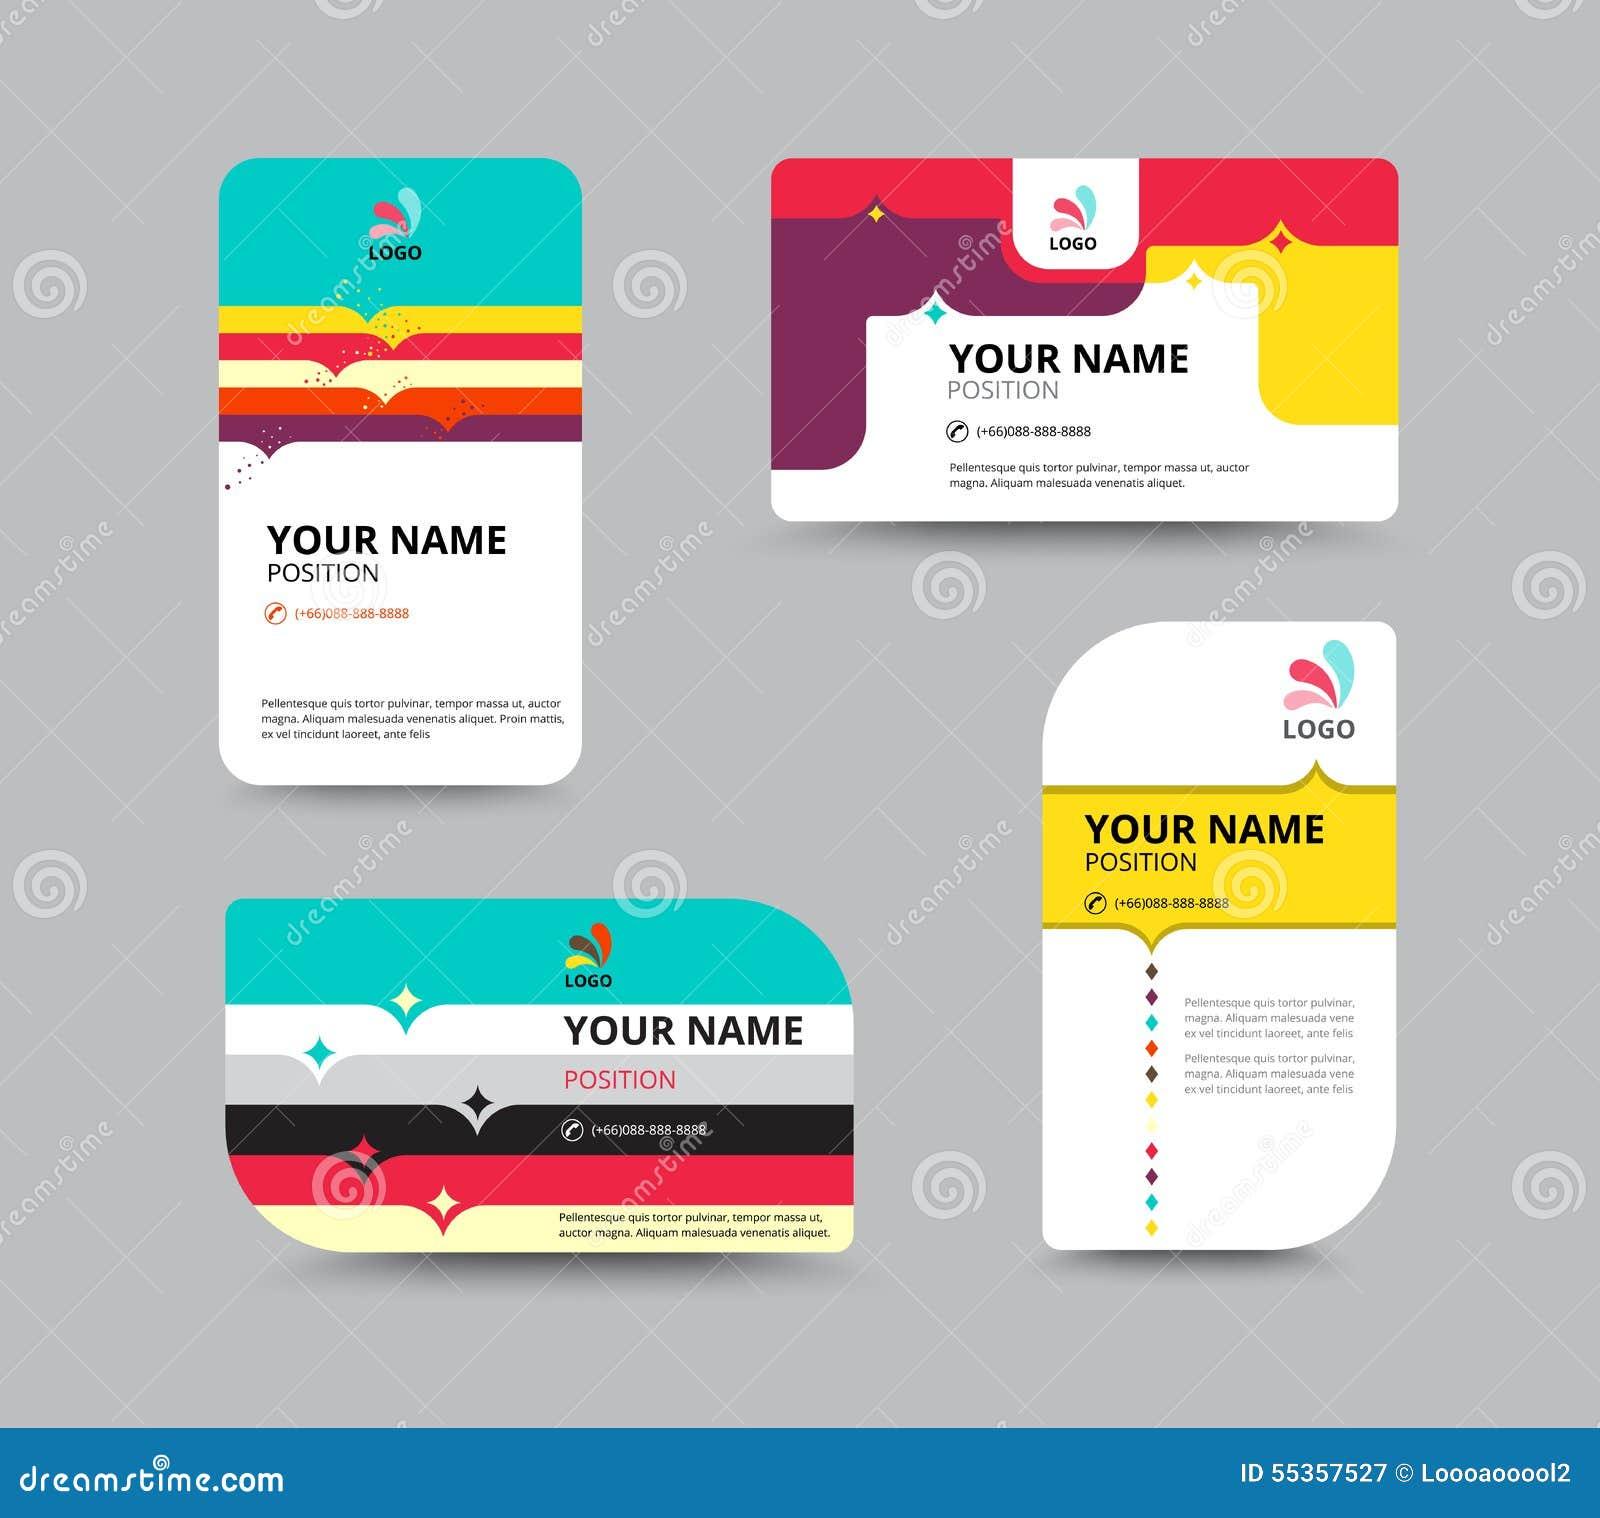 Visiting card layout novaondafm cheaphphosting Images